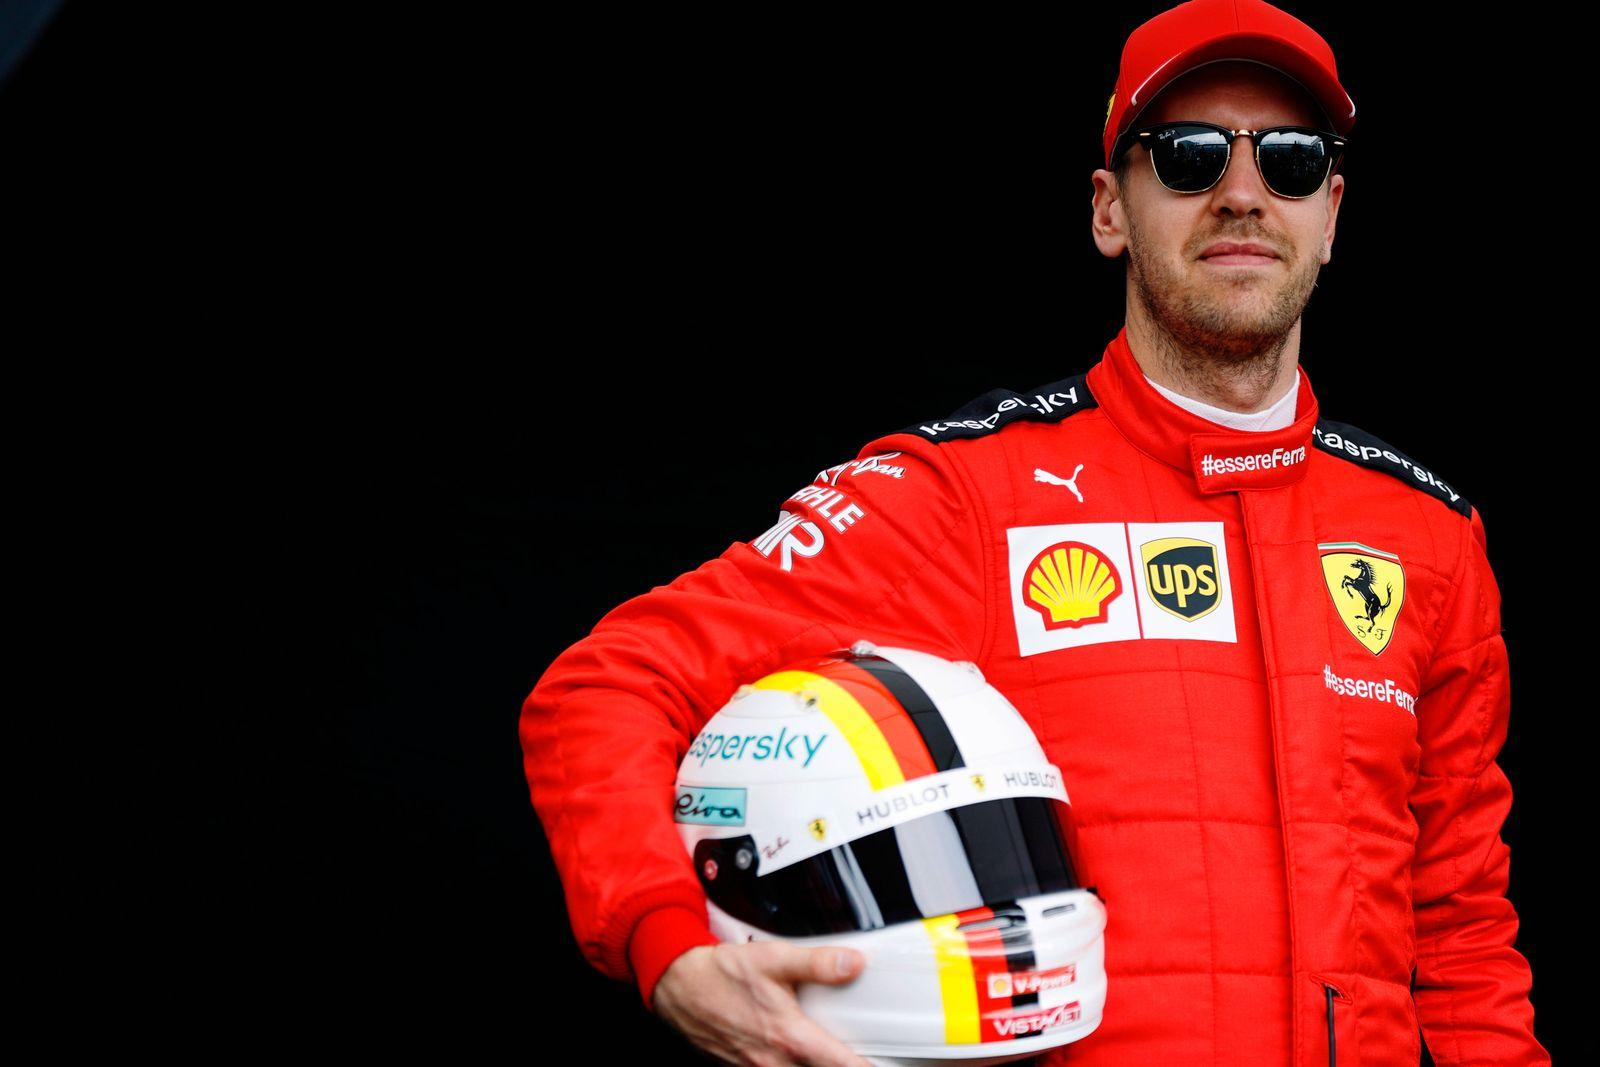 2020 Australian GP MARCH 12: Sebastian Vettel, Ferrari during the Australian GP on March 12, 2020. (Photo by Andy Hone